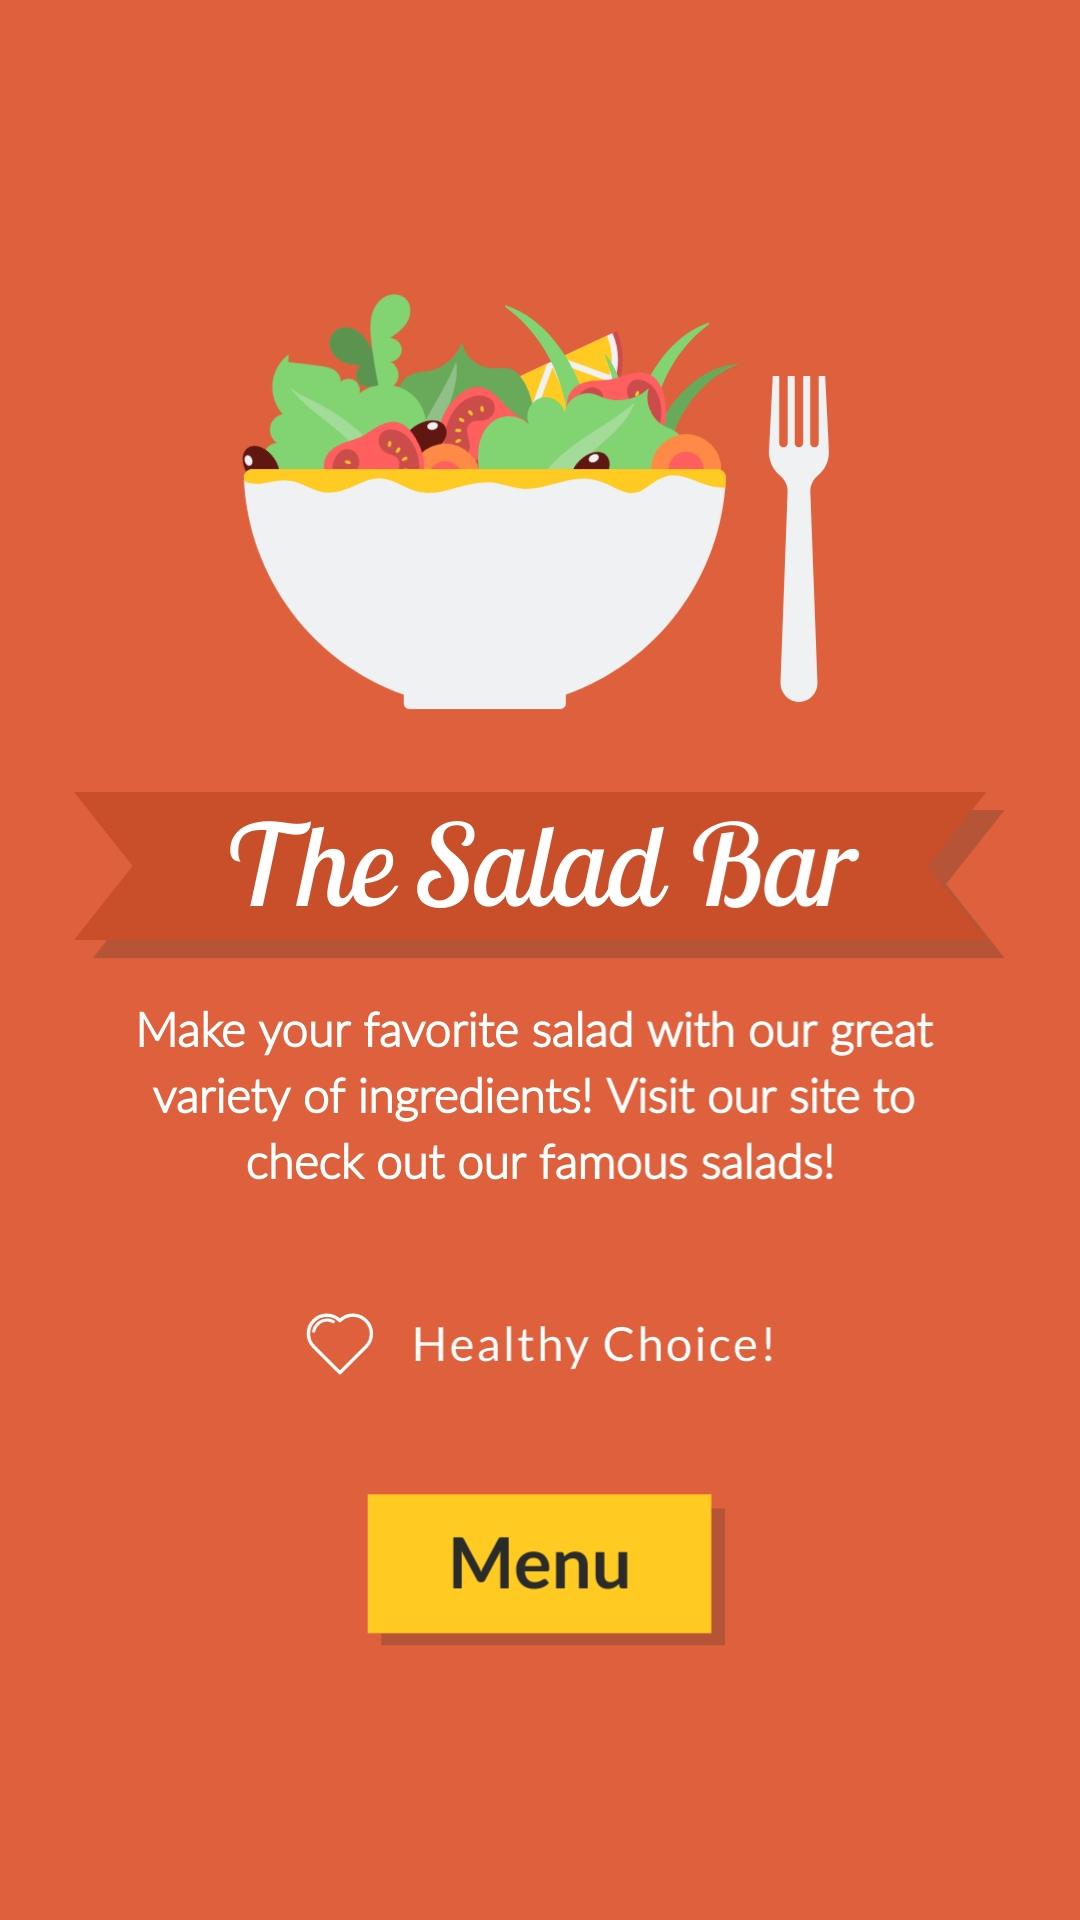 The Salad Bar Vertical Template